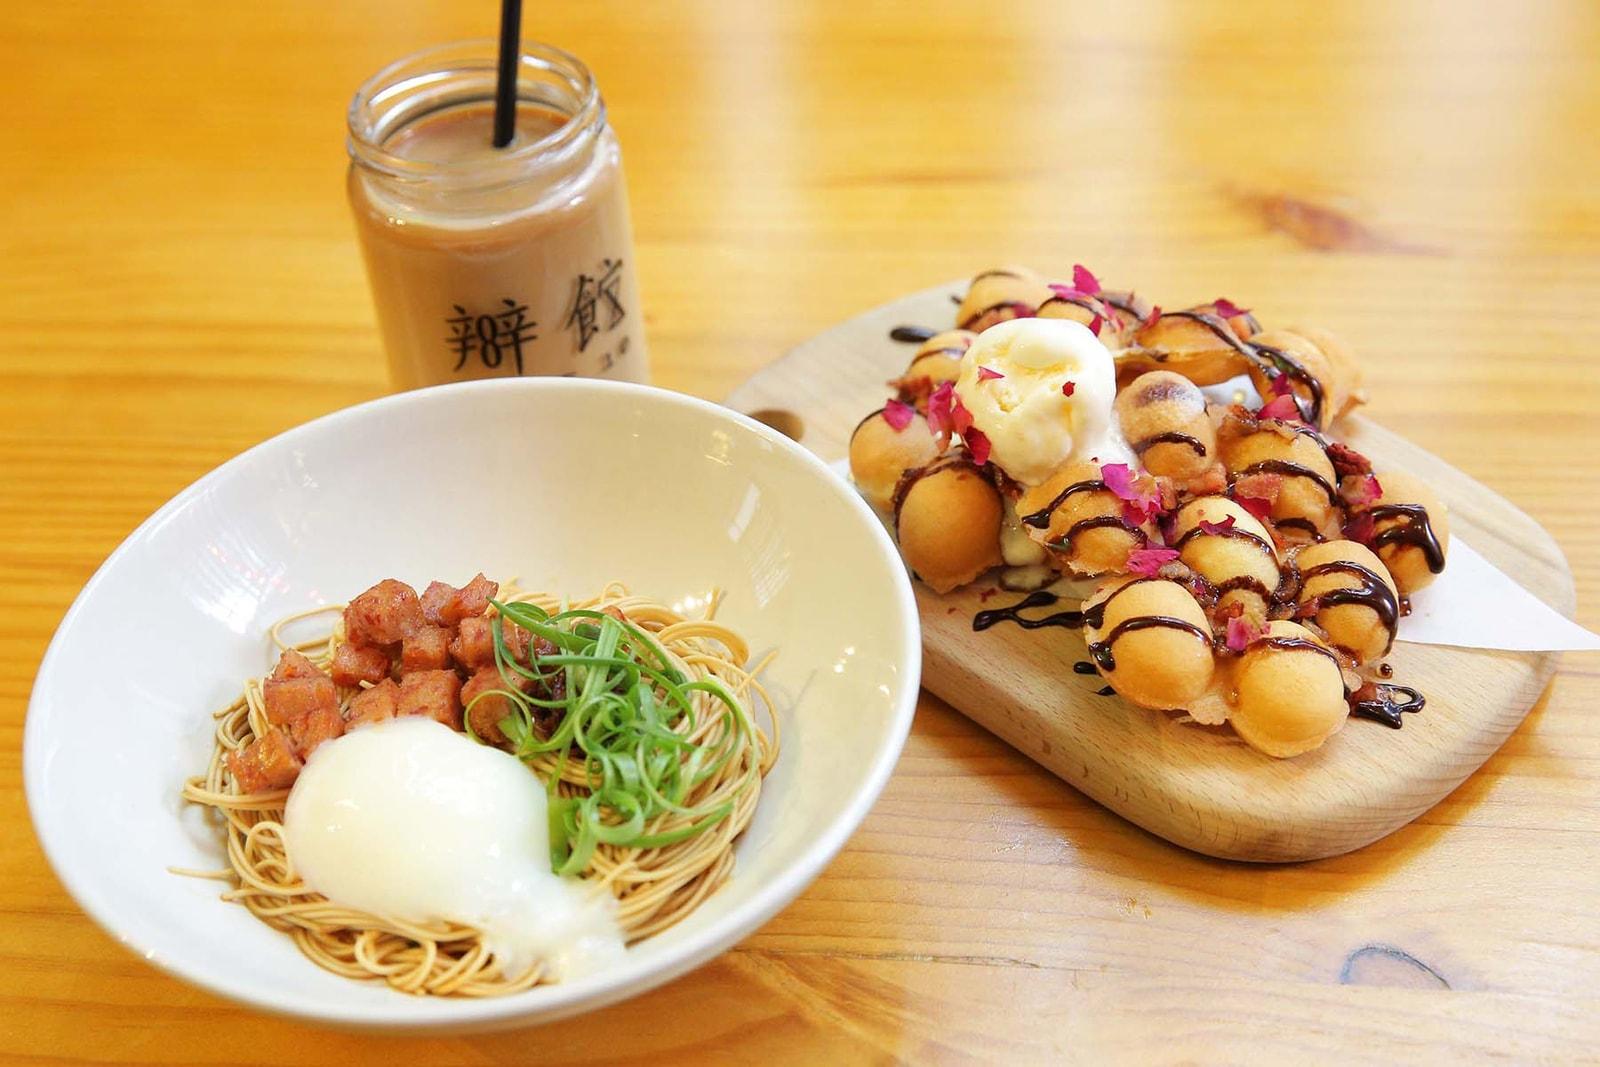 HYPEBEAST Eats... 出前一丁 x 辦館 LOF 10 於香港開設概念店